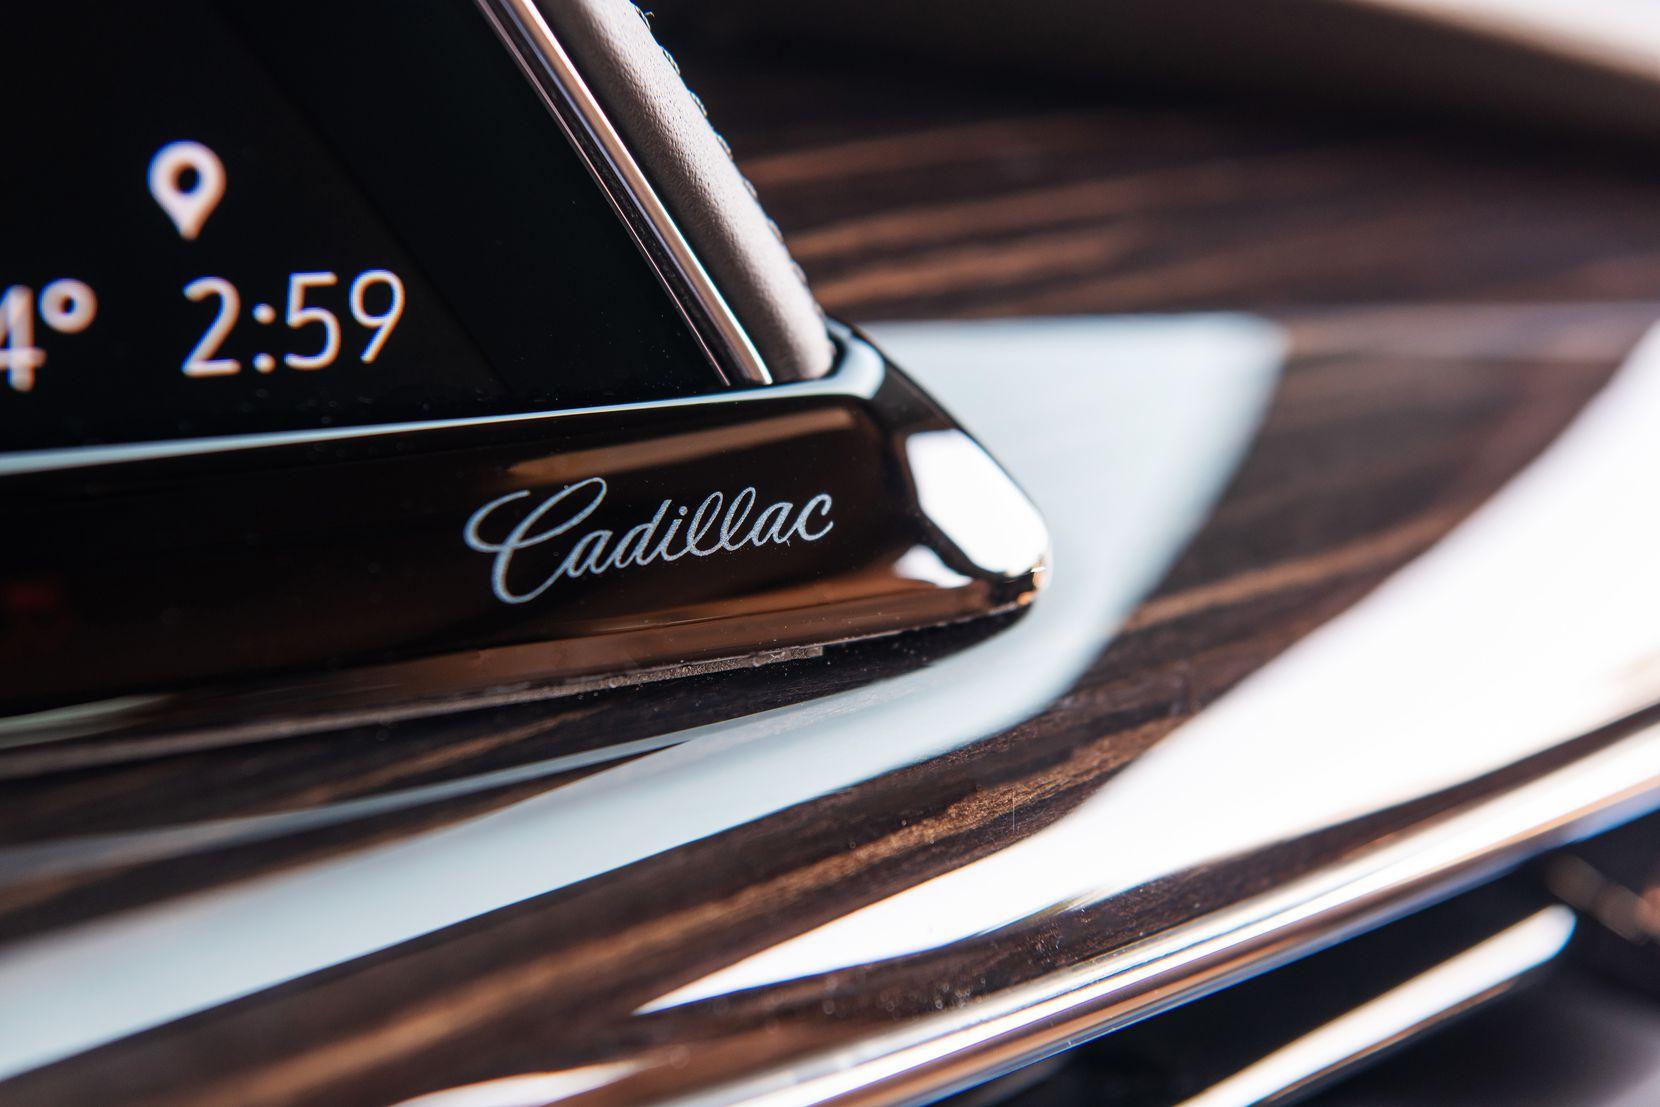 Interior accents in the 2021 Cadillac Escalade.